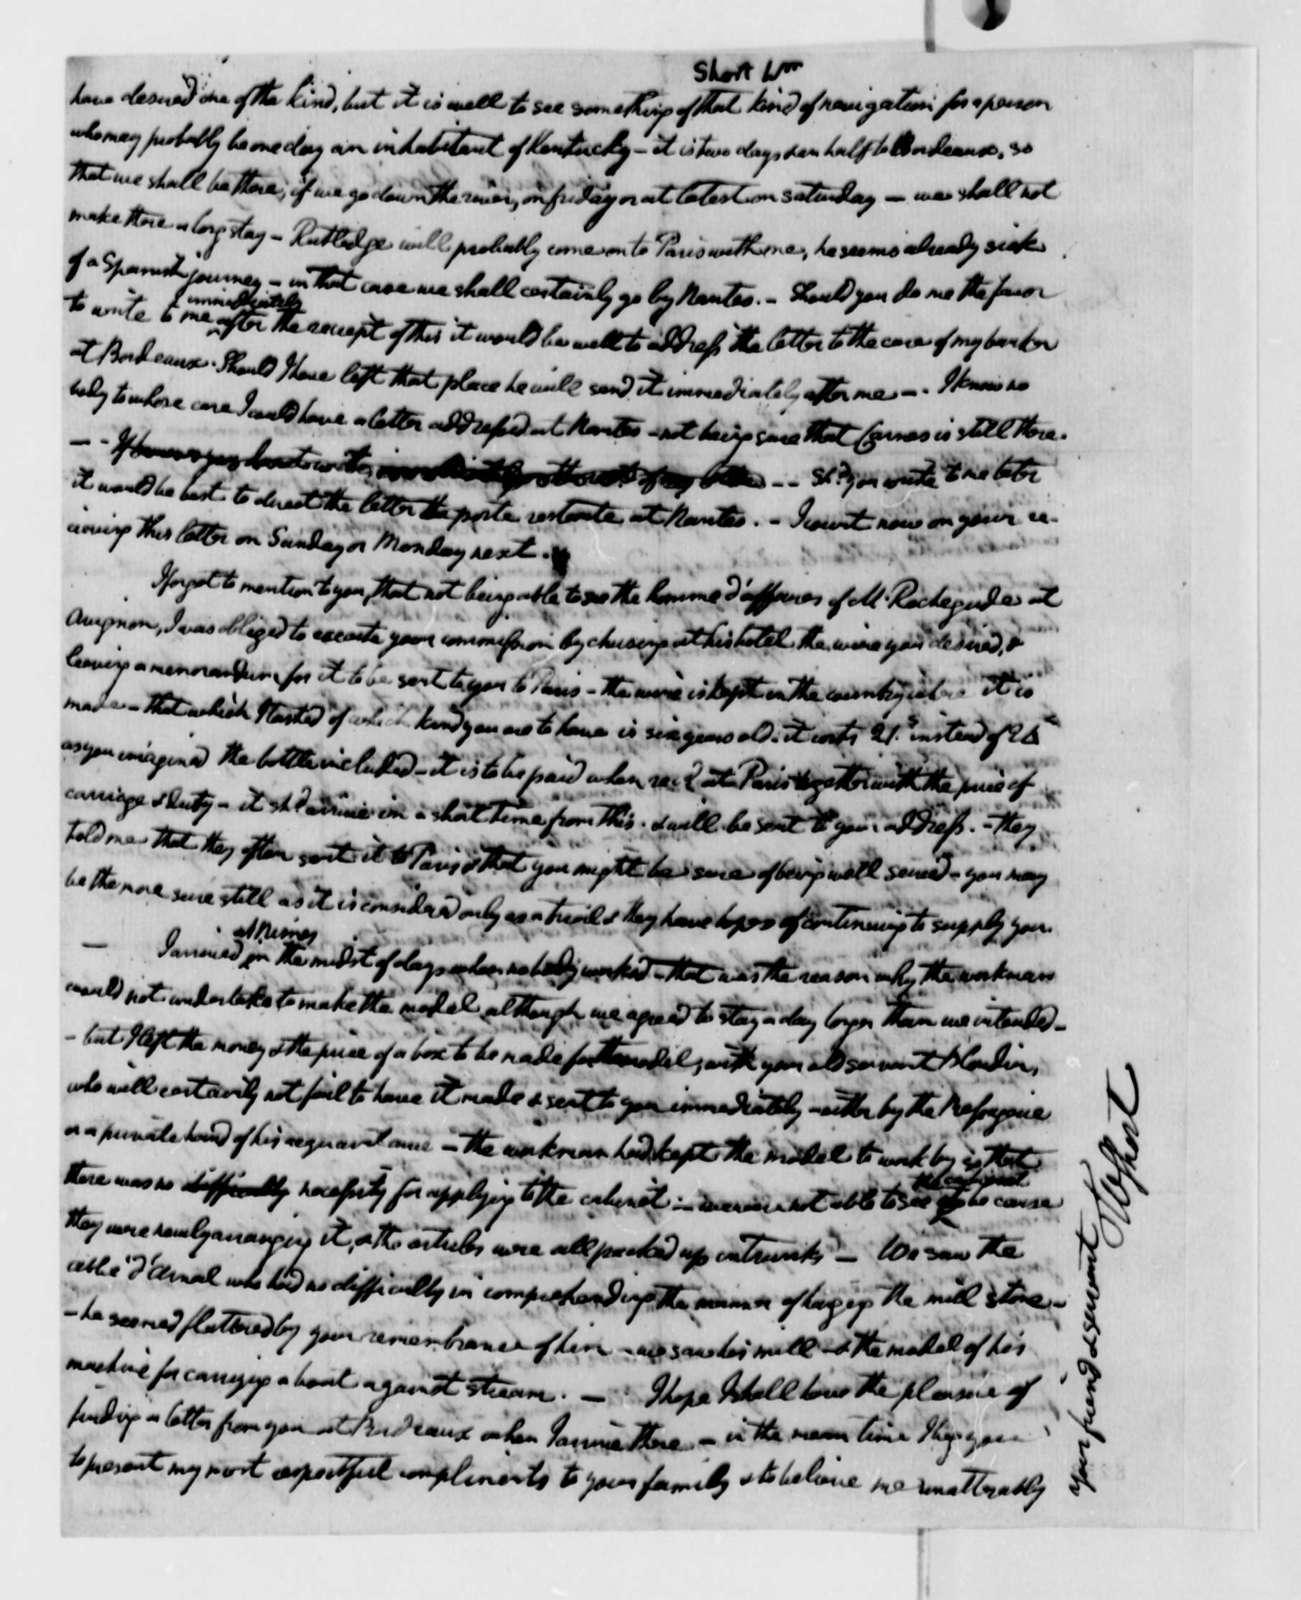 William Short to Thomas Jefferson, April 20, 1789